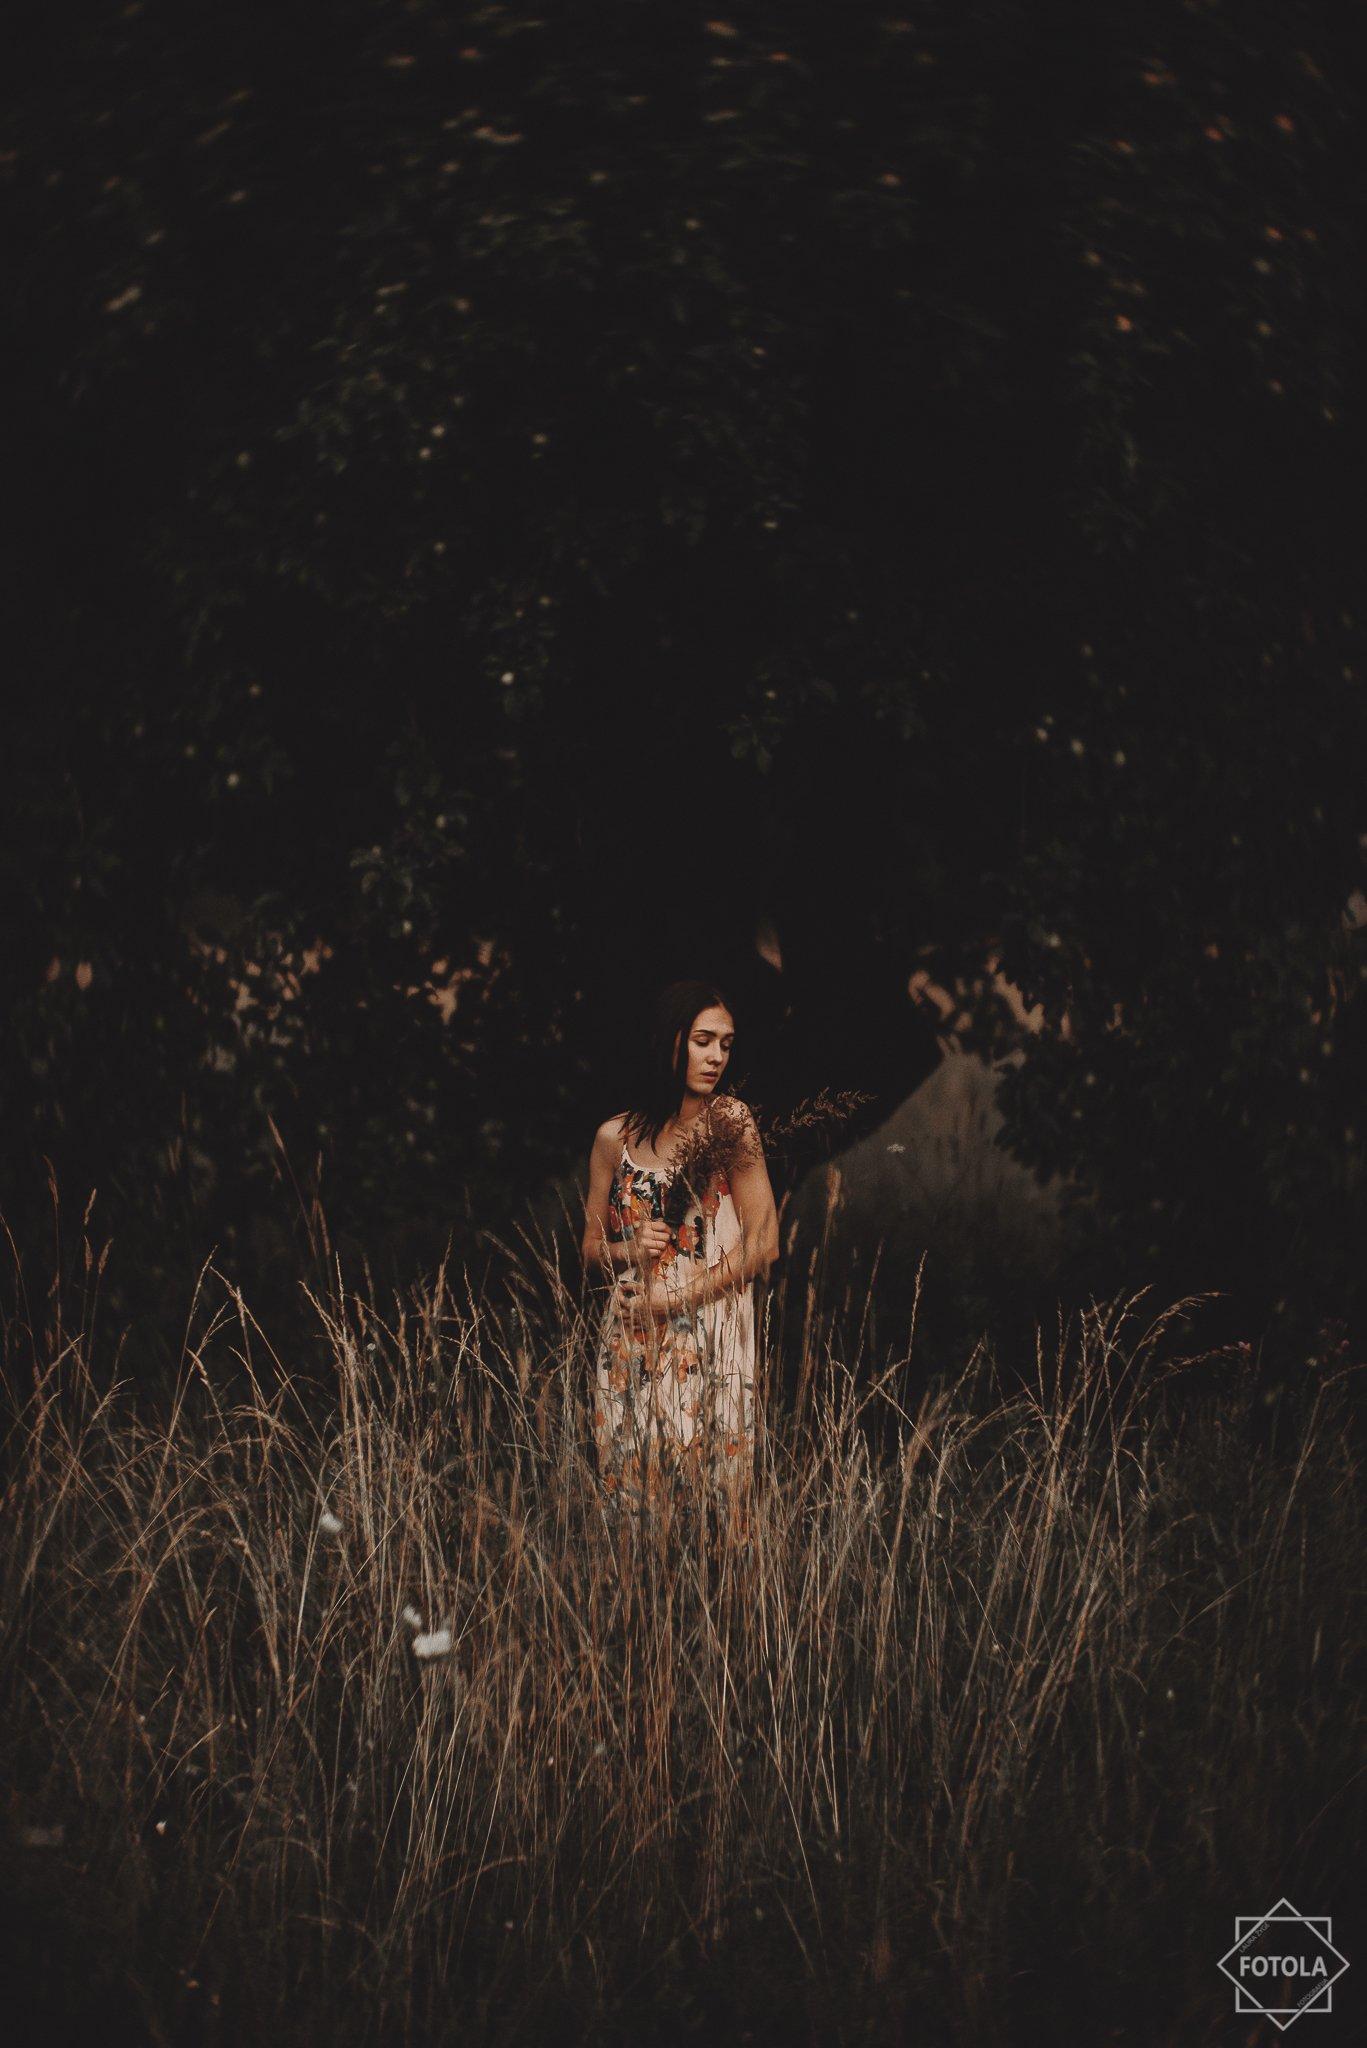 portaiture, female, model, evening, golden  hour,  портрет, женщины, вечер, Laura Žygė